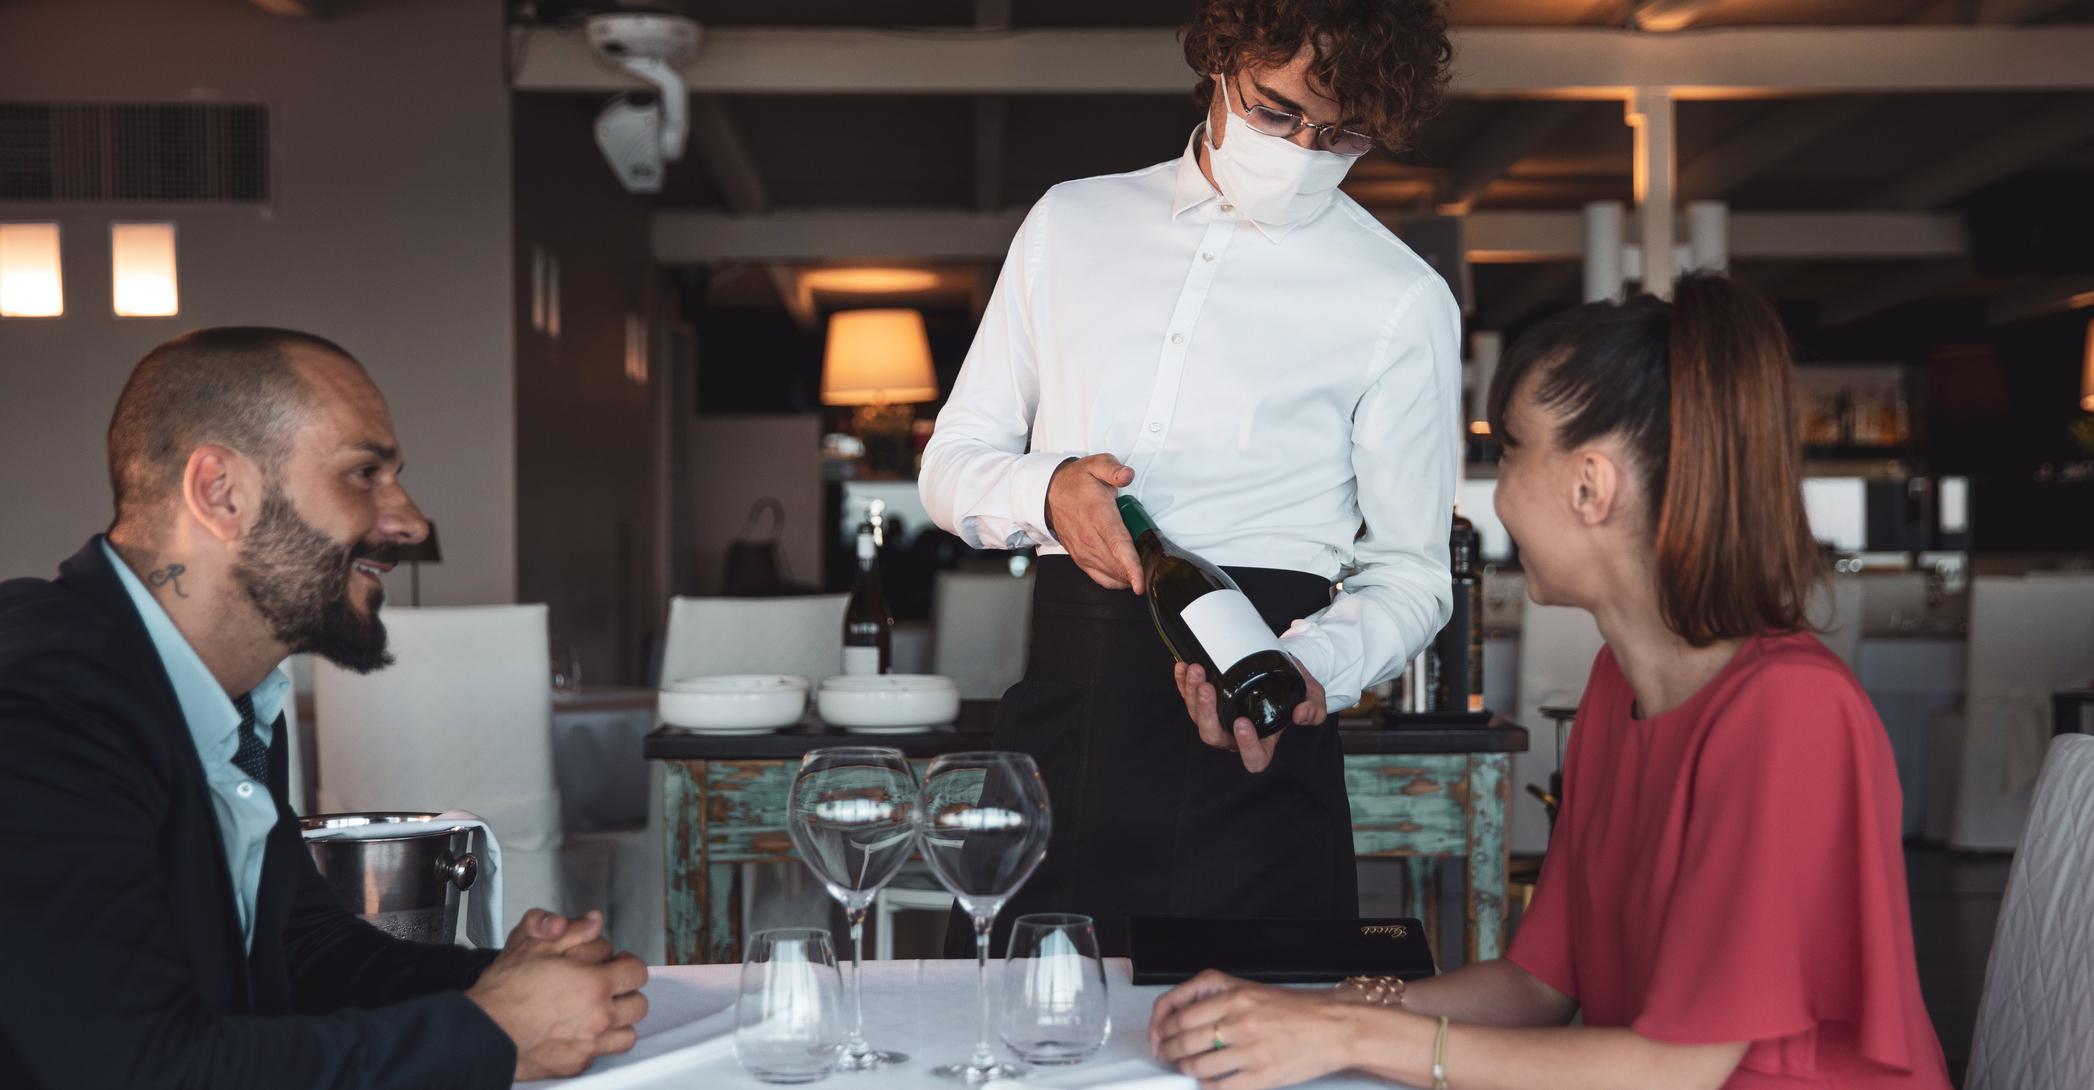 Romantic dining in a luxury restaurant